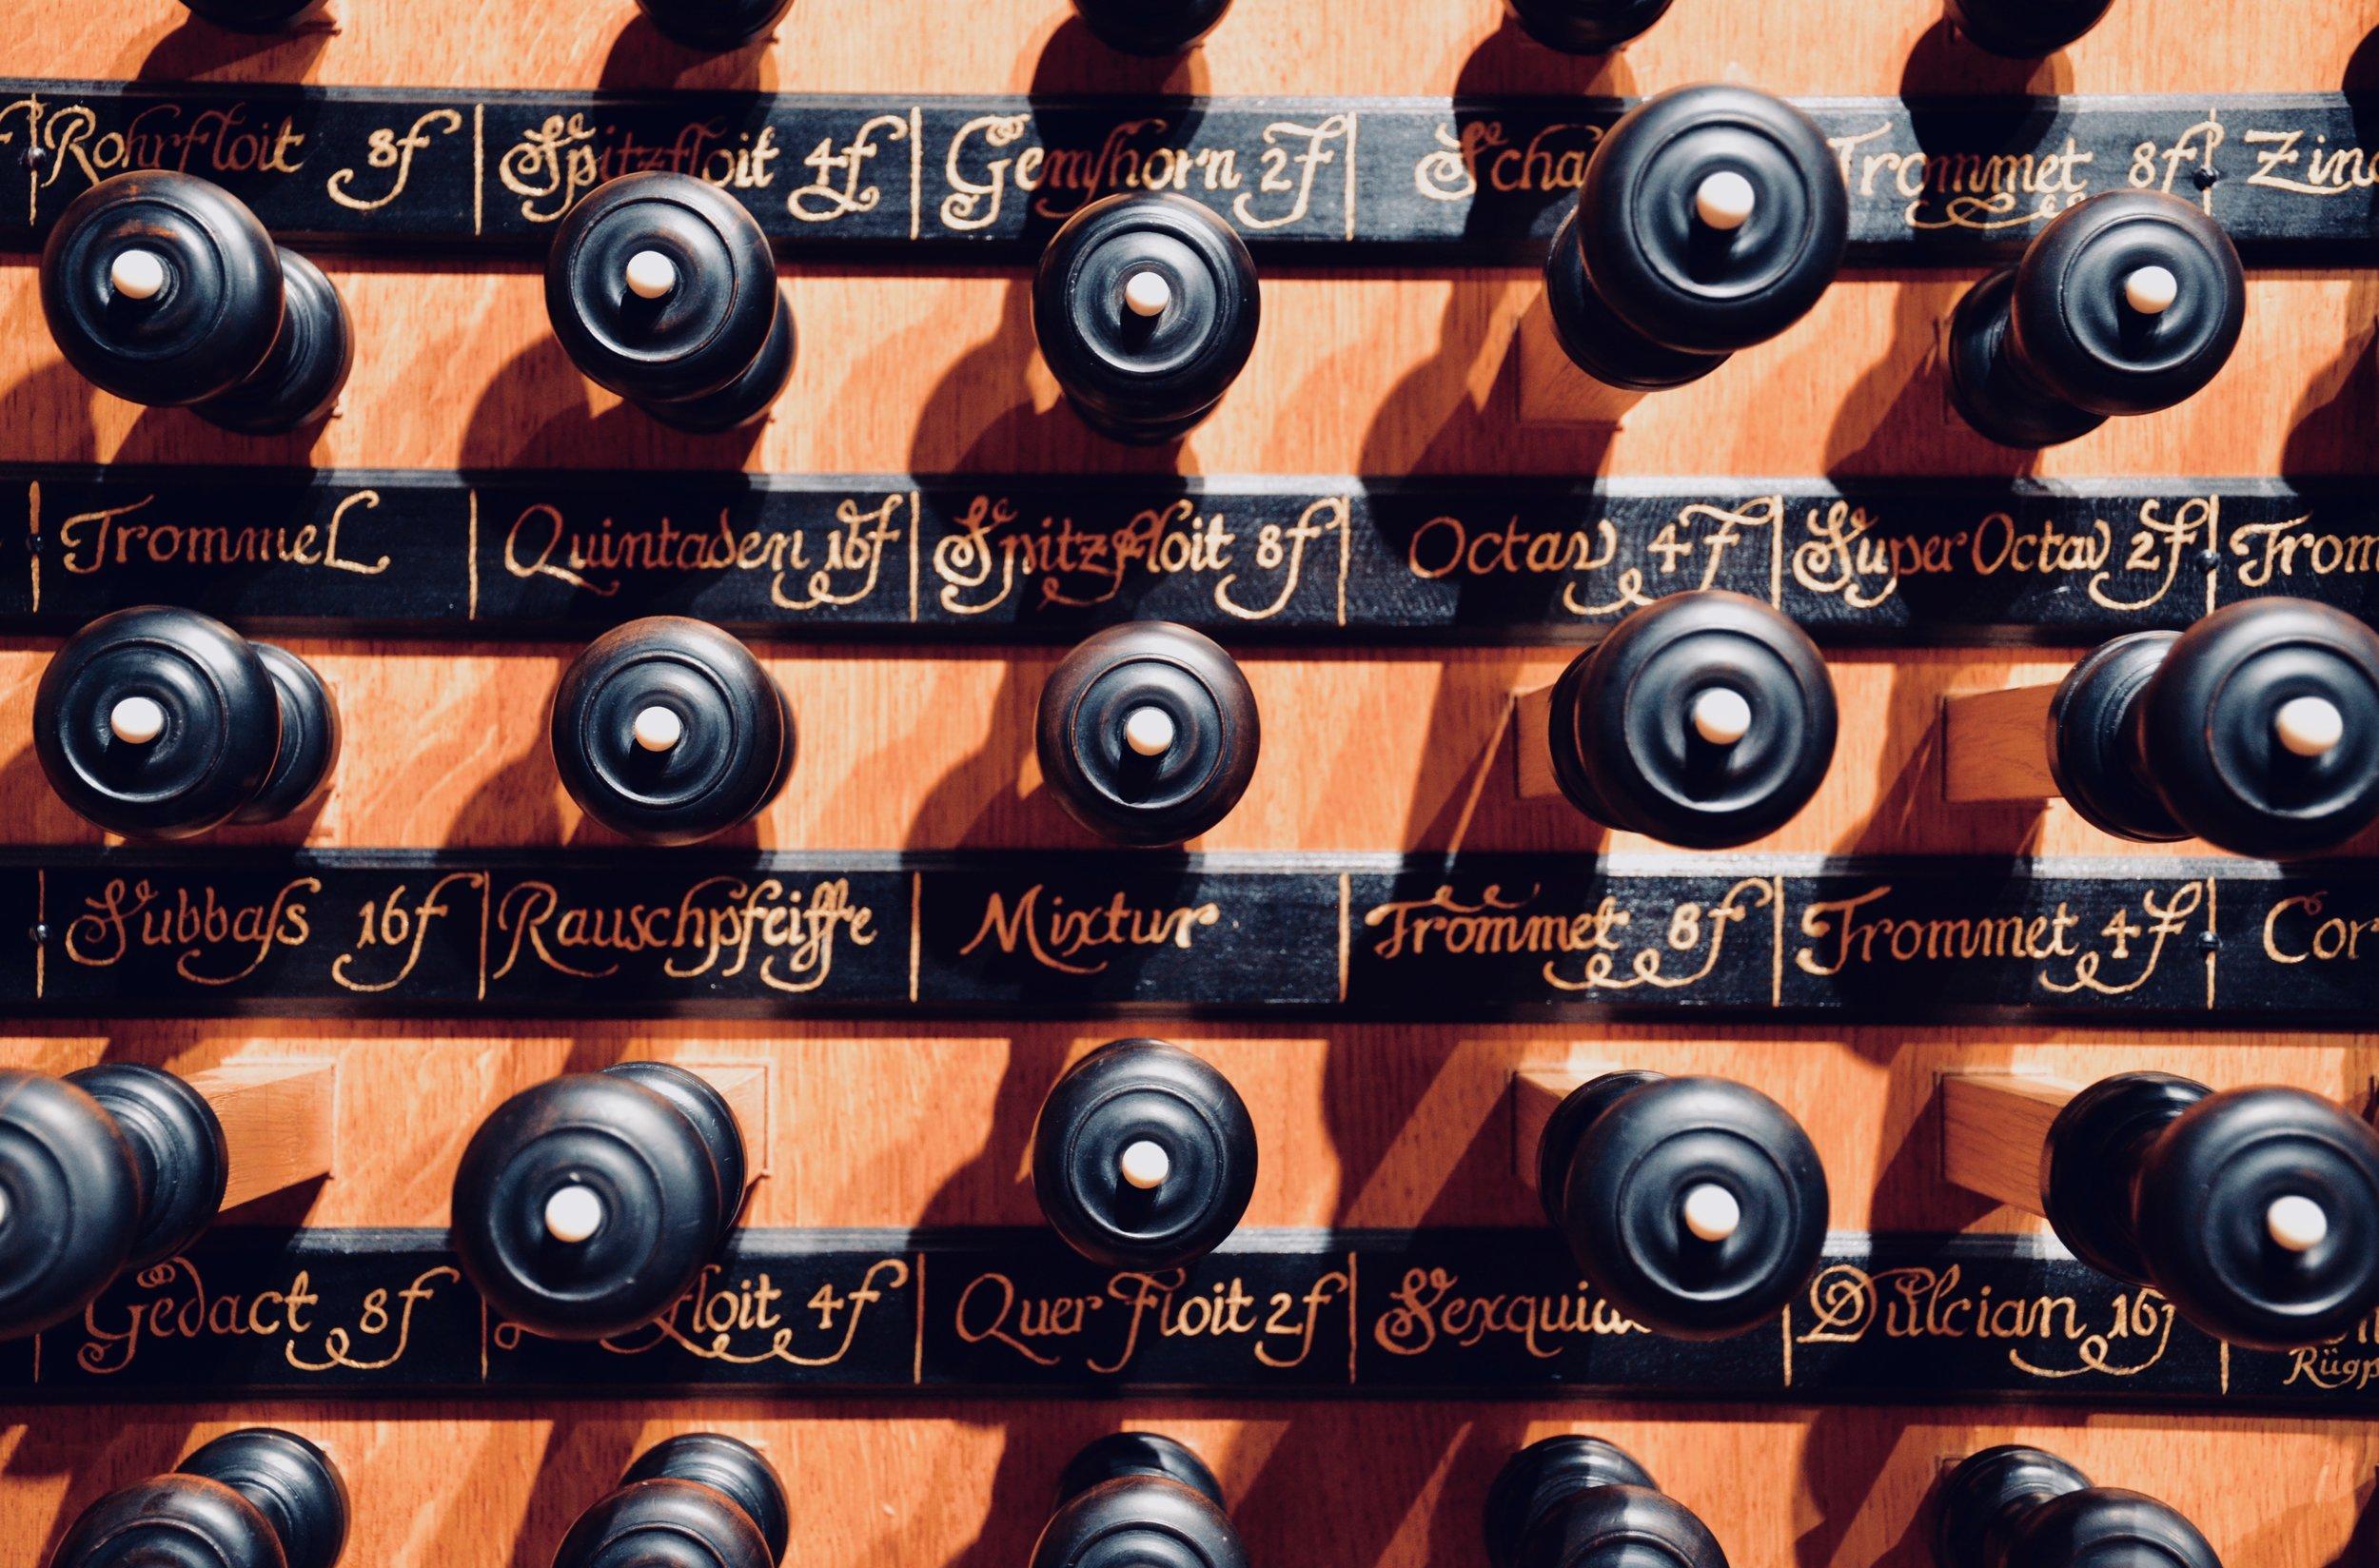 Stopknob detail, 2000 GoART North German Baroque Research Organ in Örgryte New Church, Göteborg, Sweden.